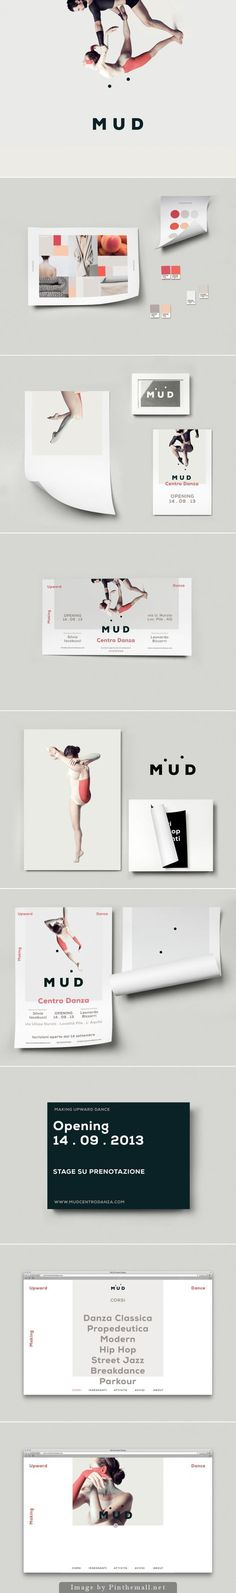 MUD #brand #identity